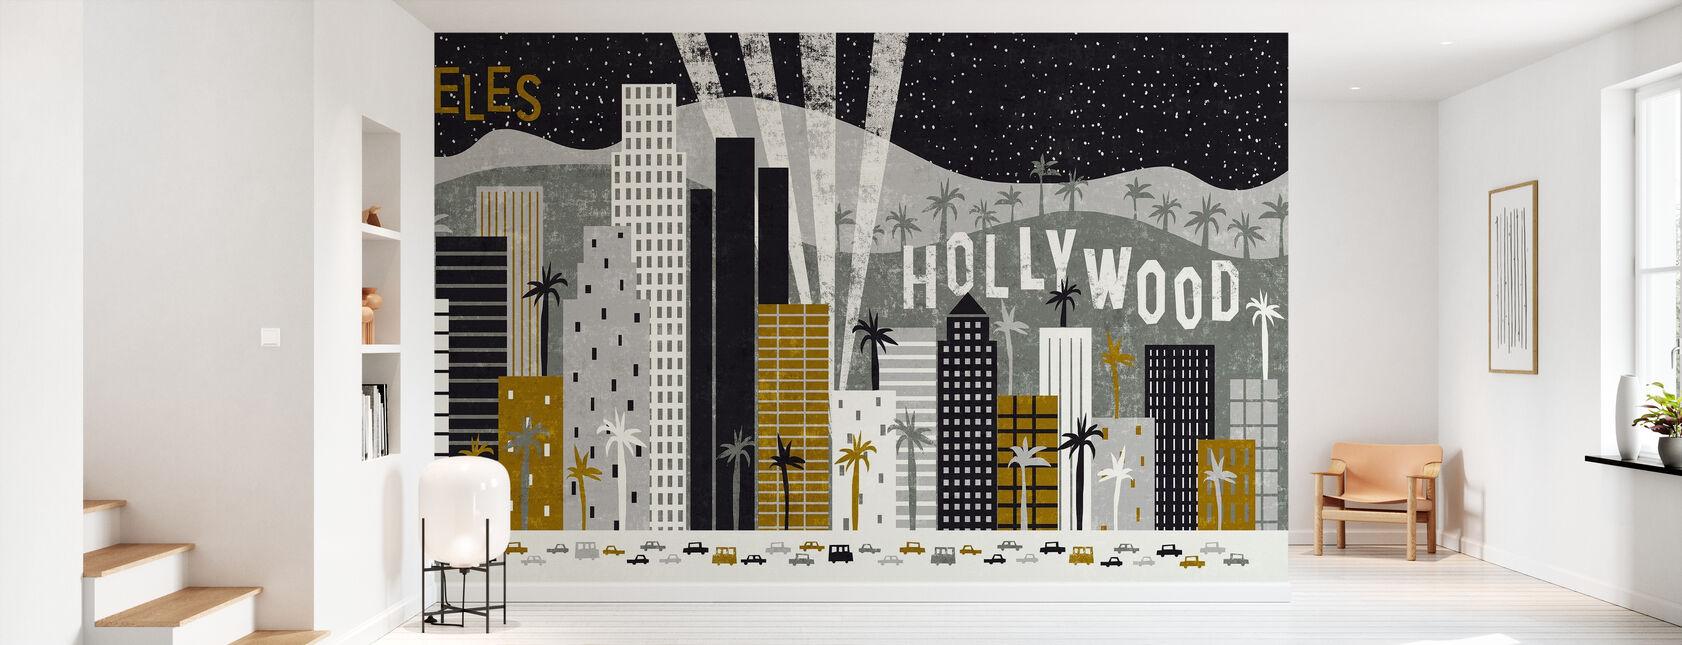 Hey Los Angeles - Wallpaper - Hallway